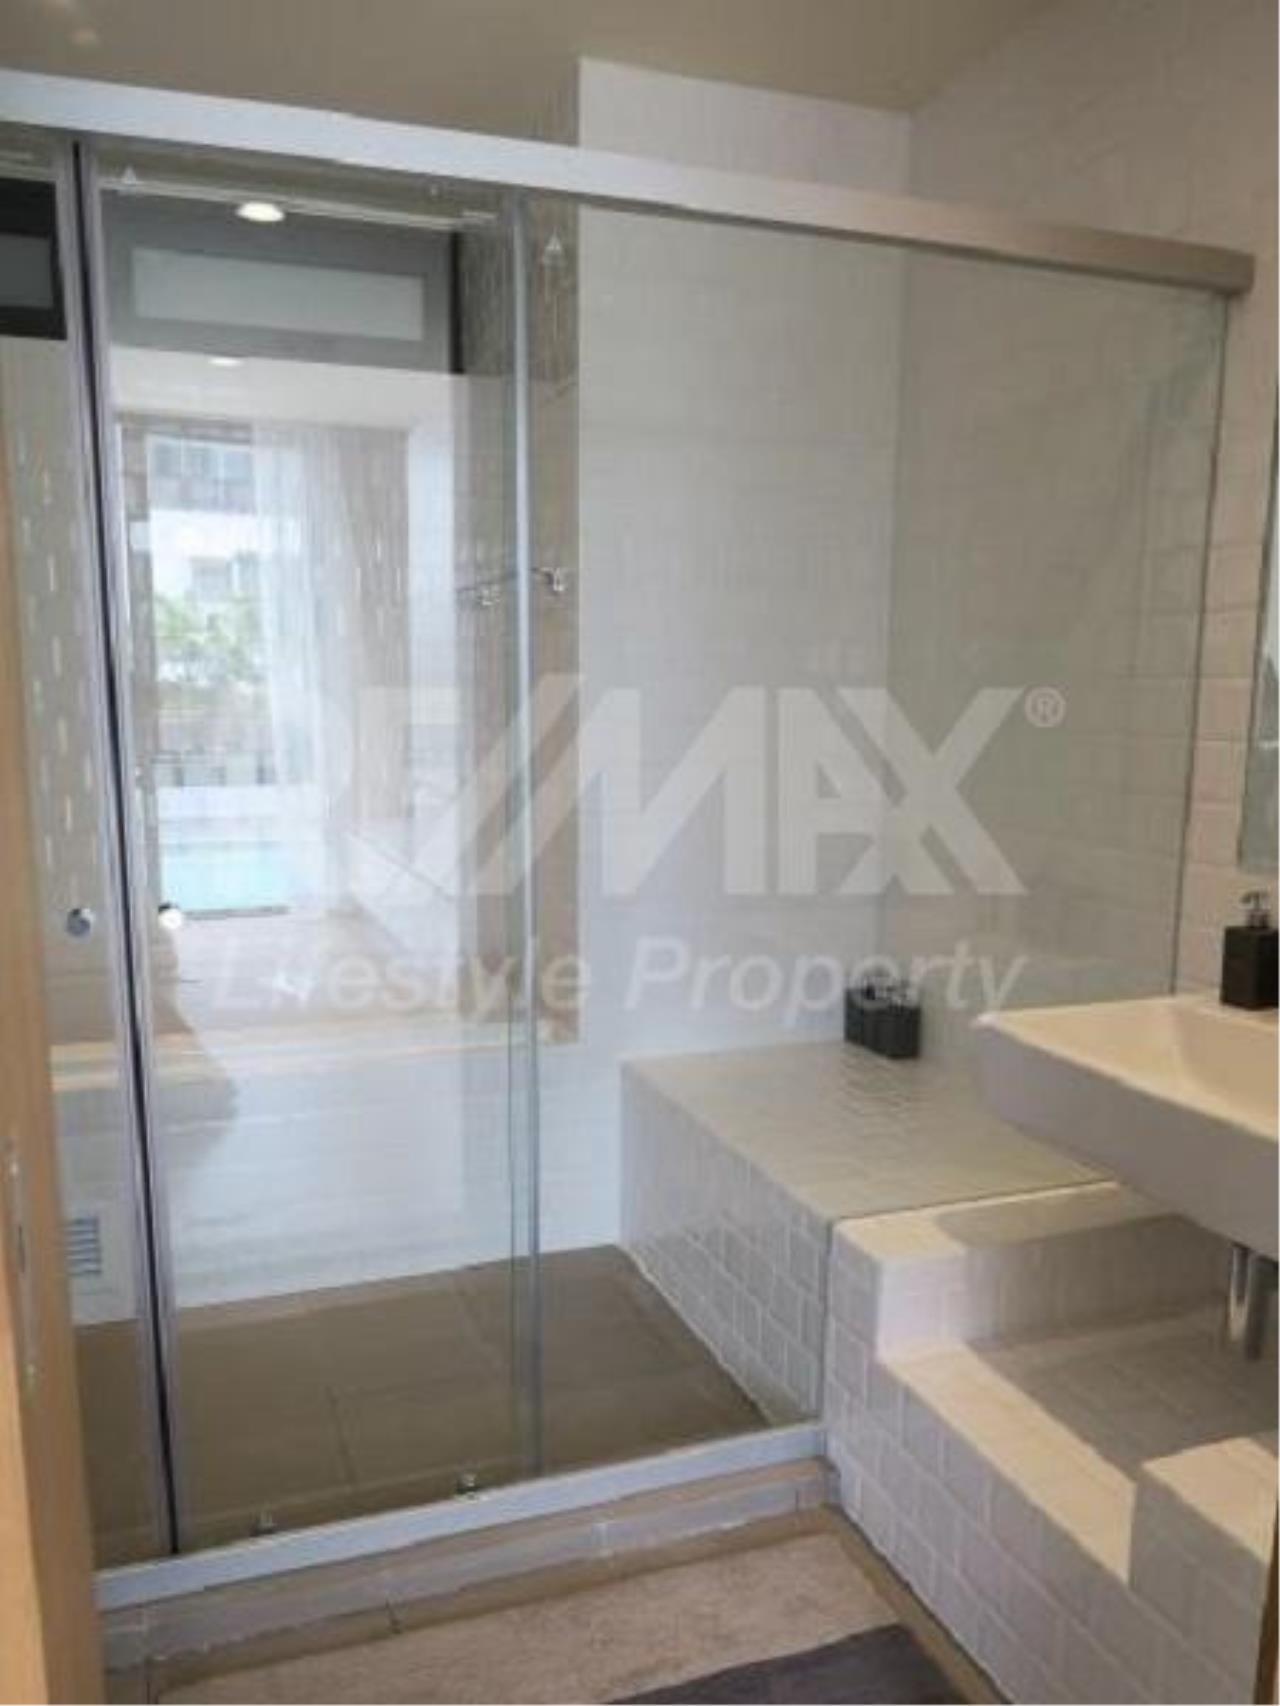 RE/MAX LifeStyle Property Agency's Mattani Suites Ekkamai 3